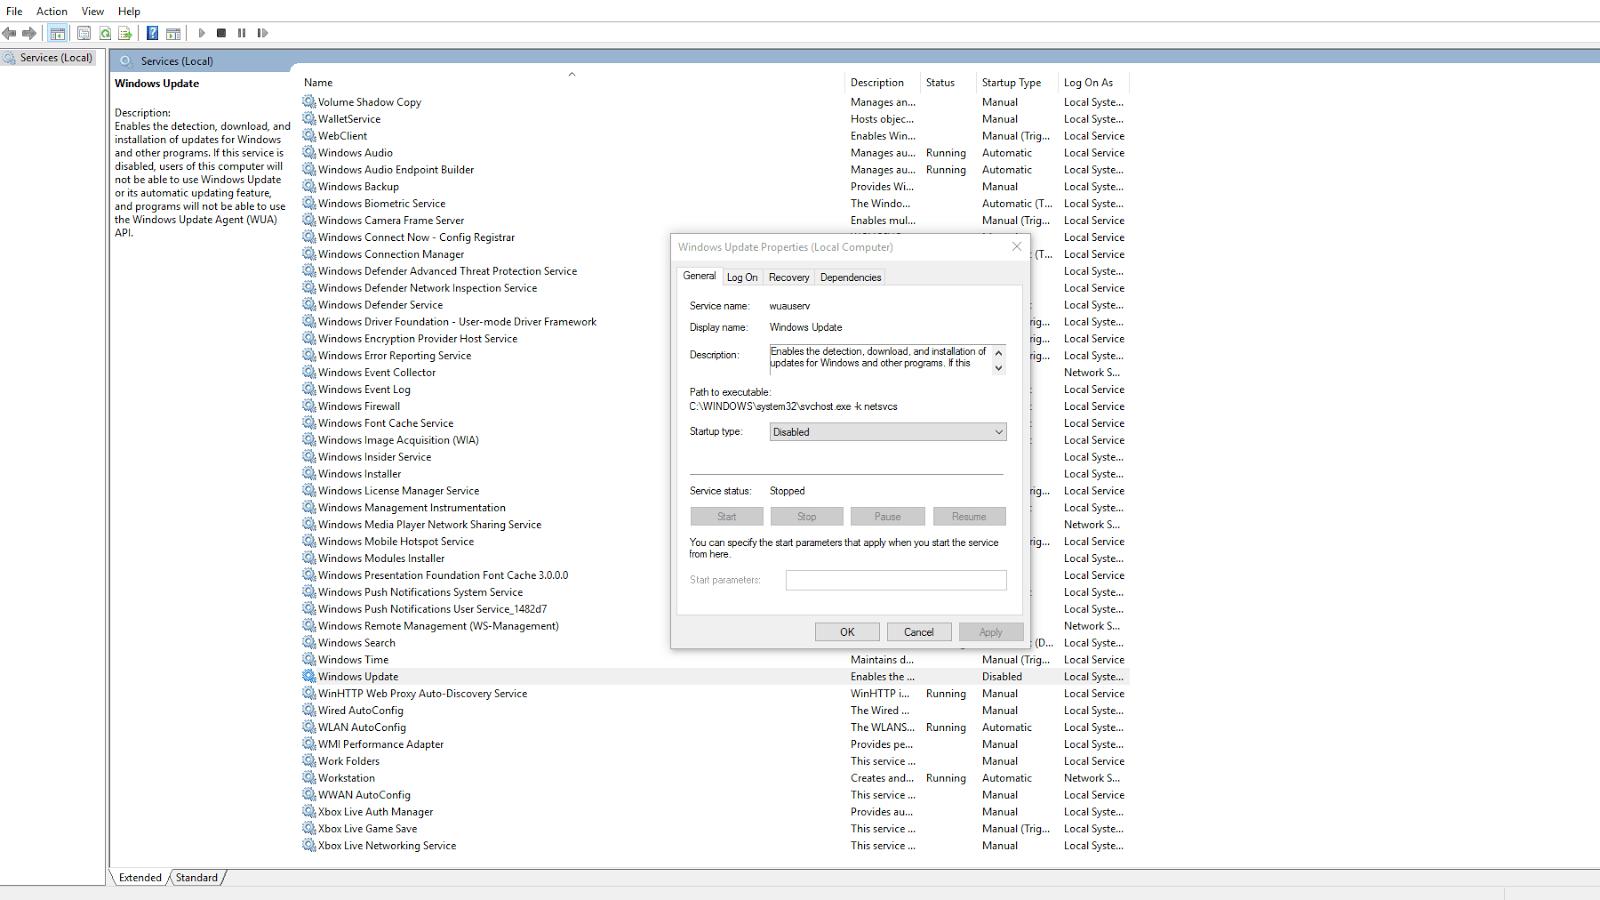 Windows 10 Ethereum Mining Guide for AMD GPUs (12 GPU